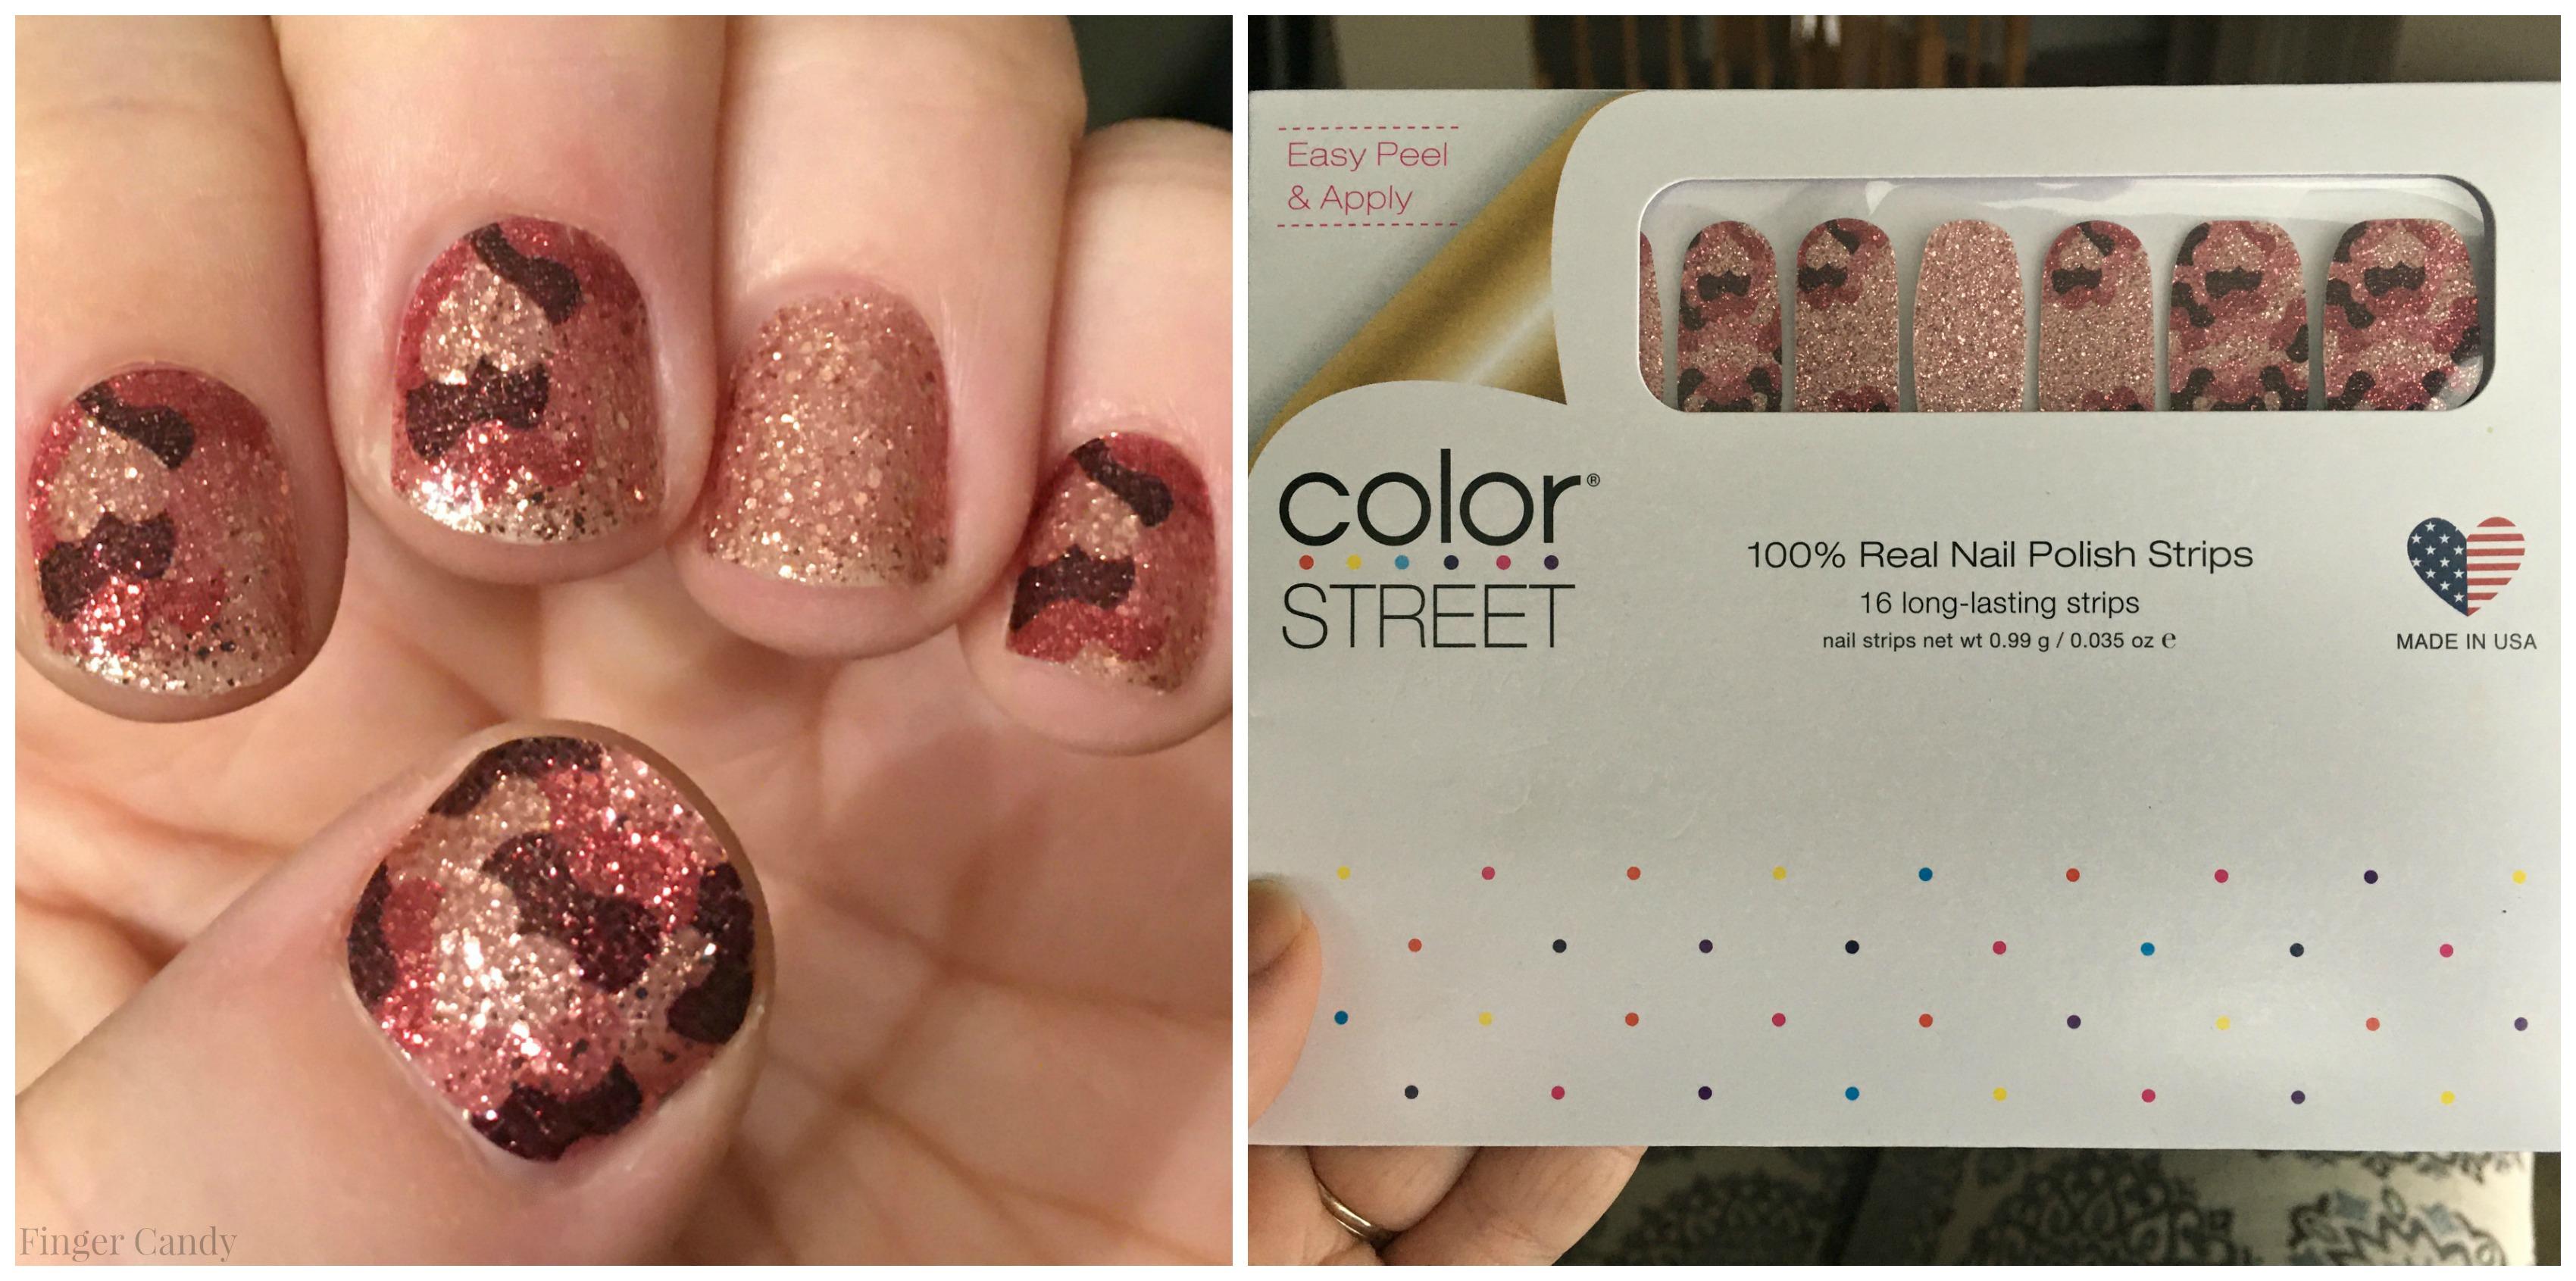 Nail Strips Collage 2